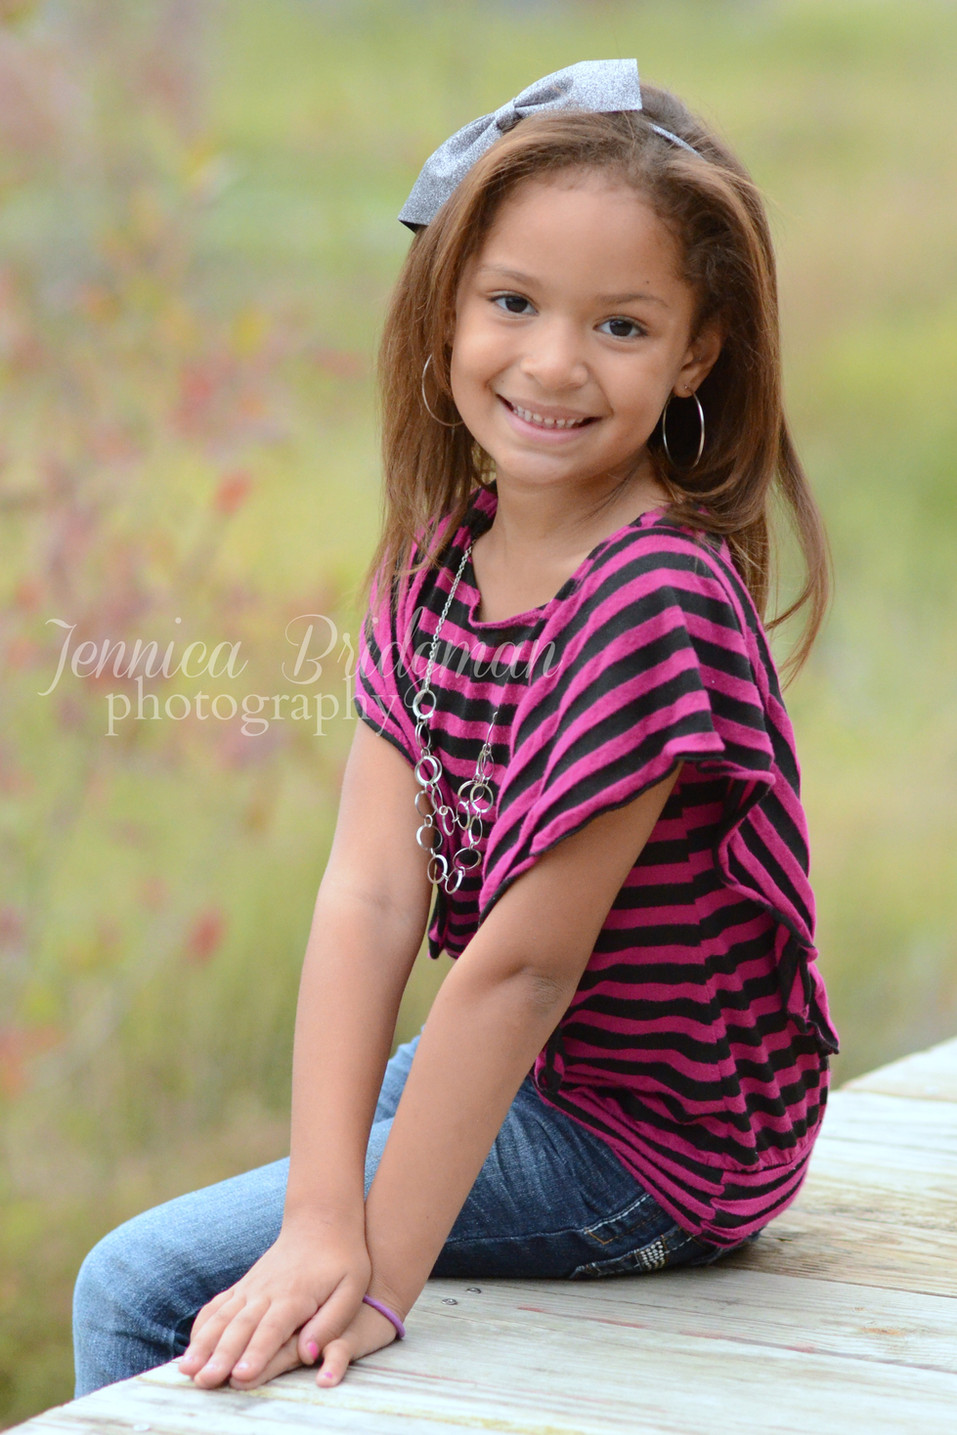 Hendrix Village Photo Session | Conway, AR Child Photographer | Jennica Bridgman Photography